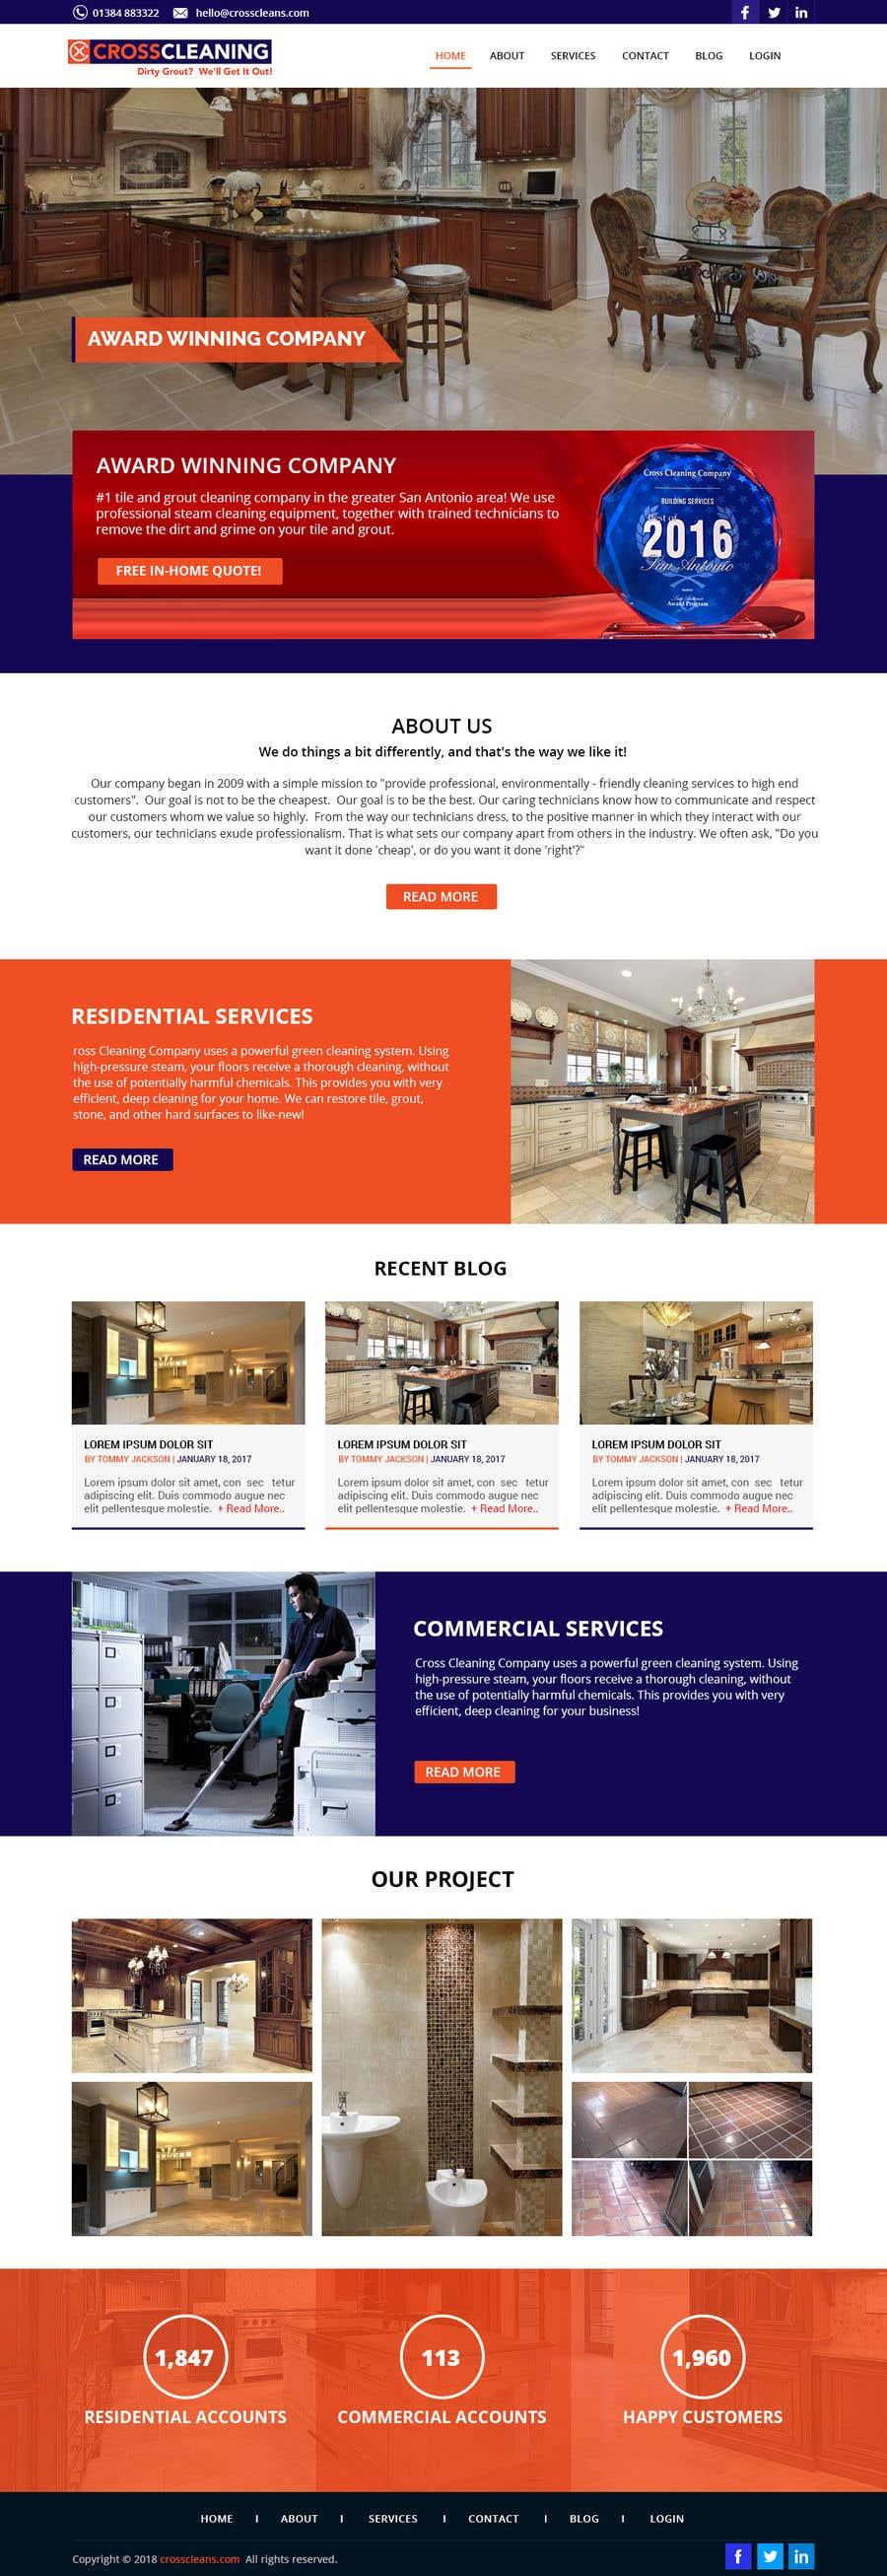 Kilpailutyö #26 kilpailussa Wow Me with Creative Redesign of Wordpress Website